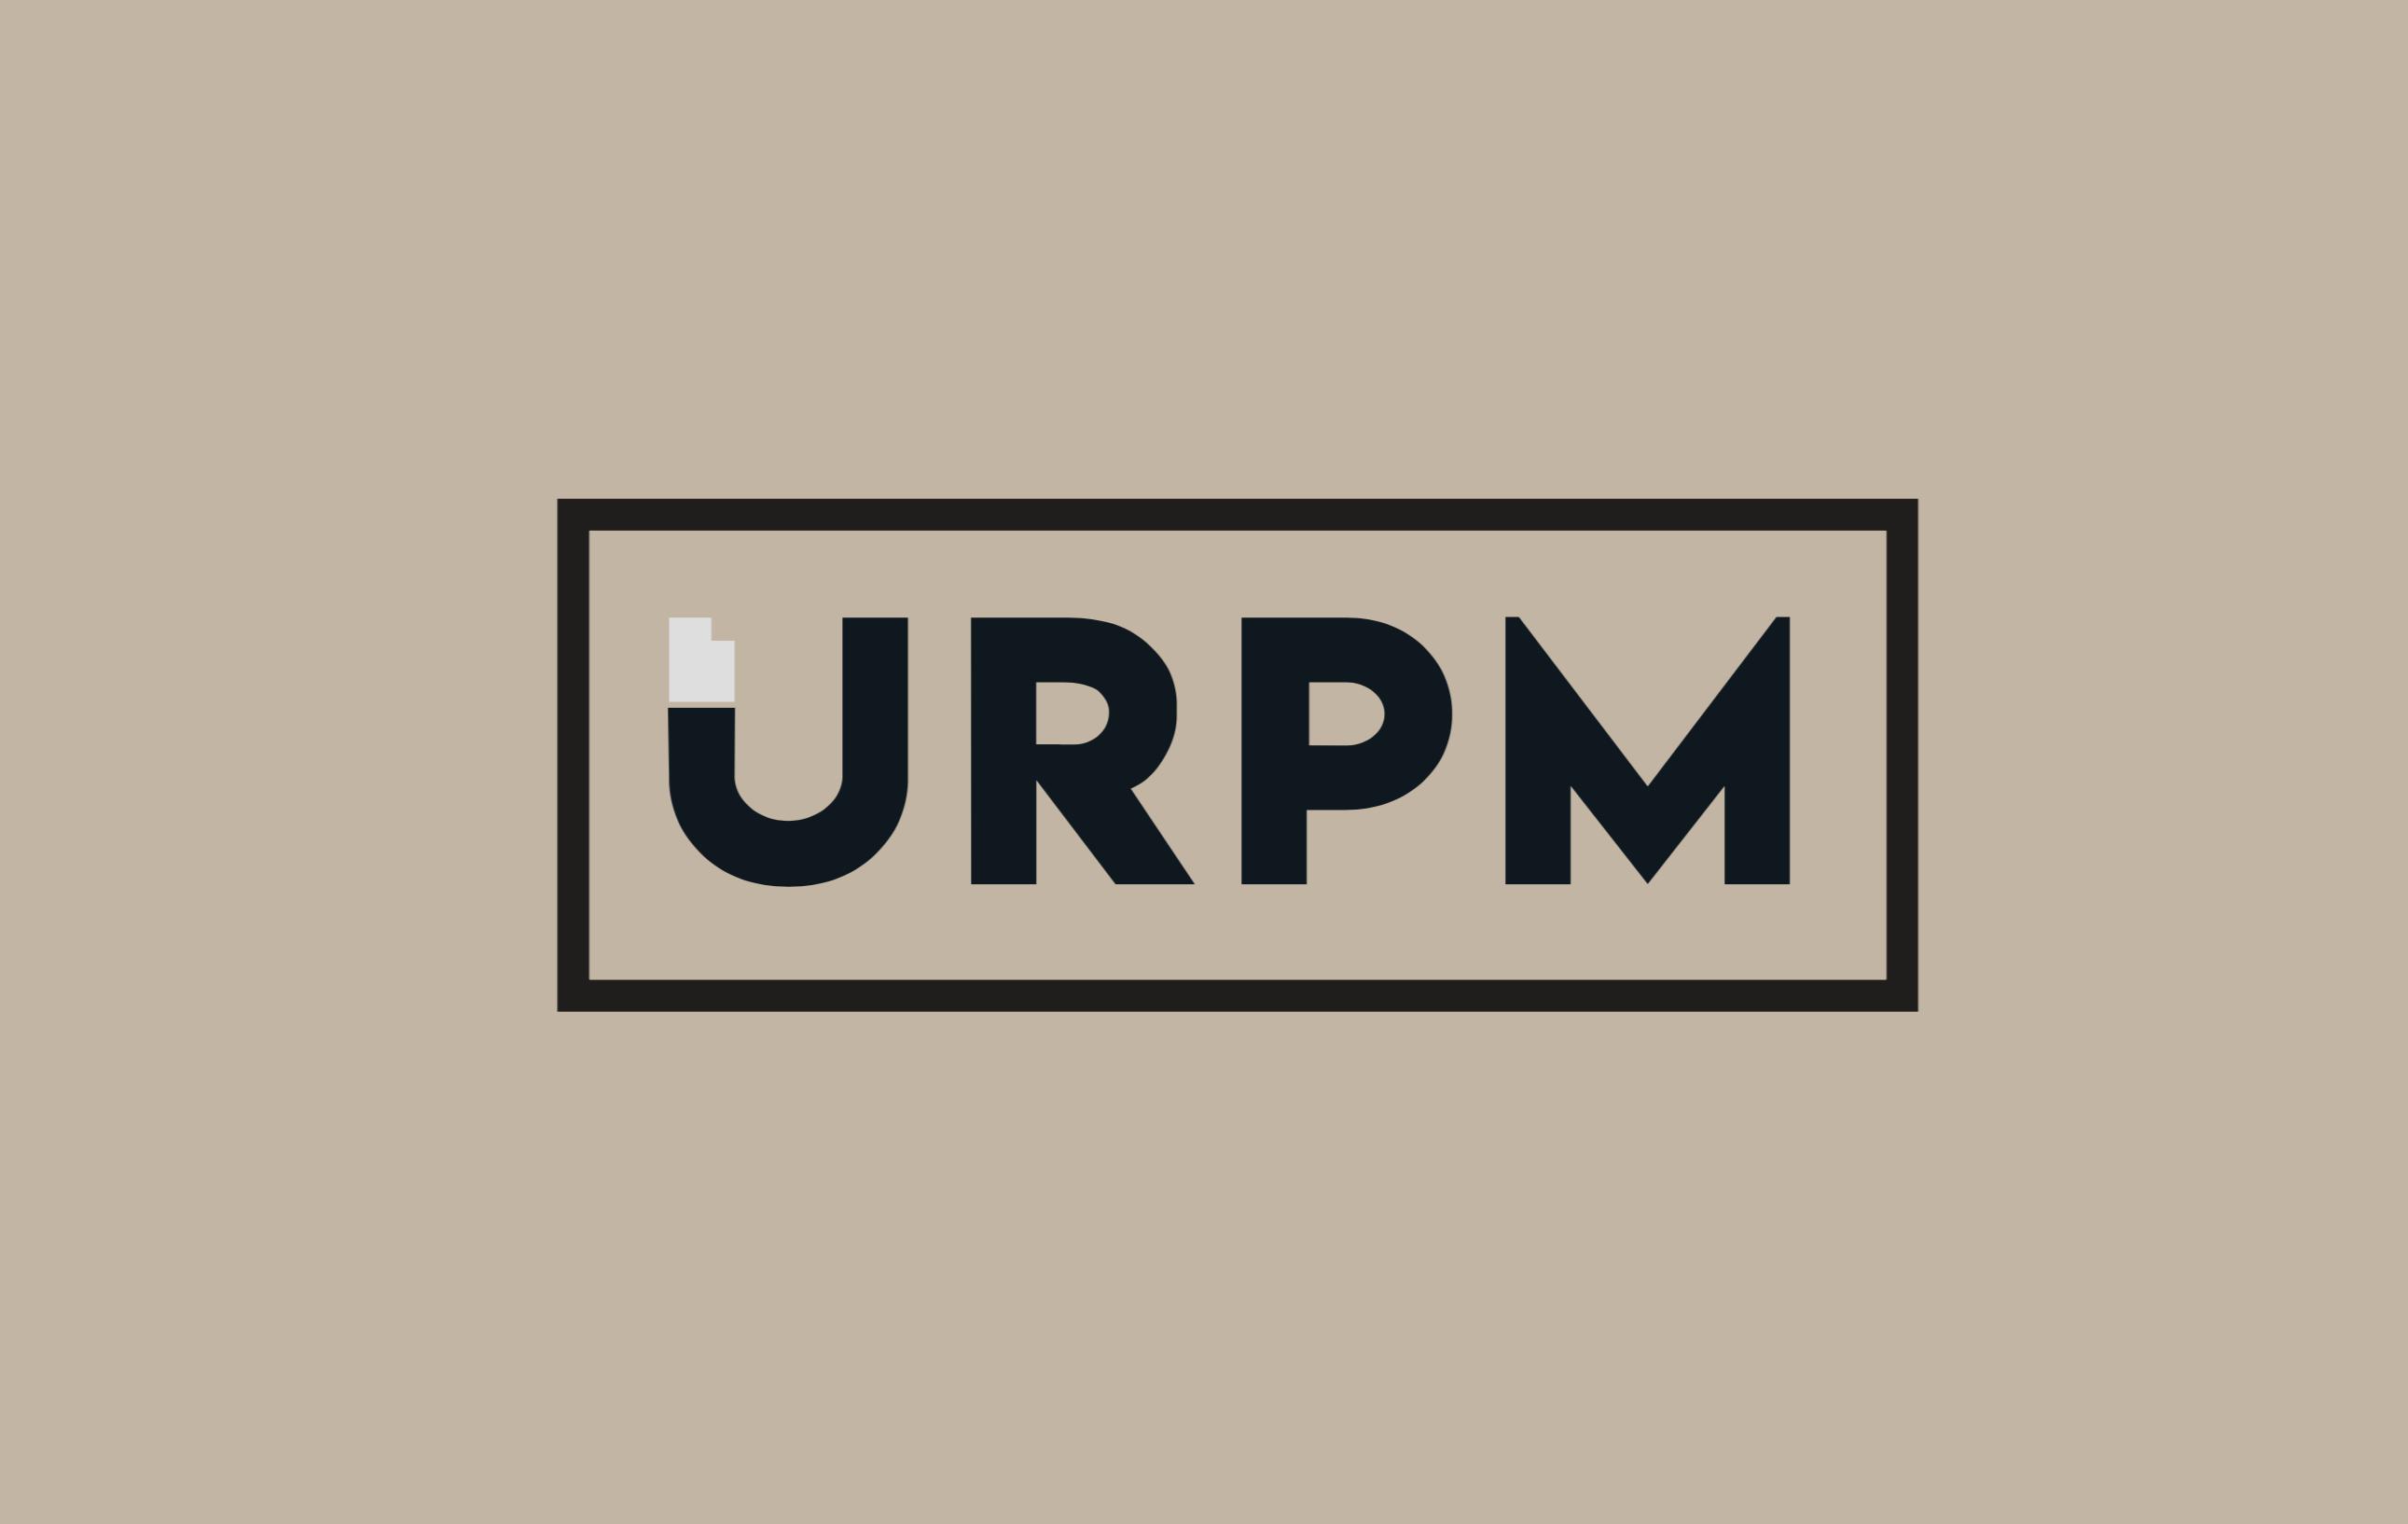 Utah Residential Property Management